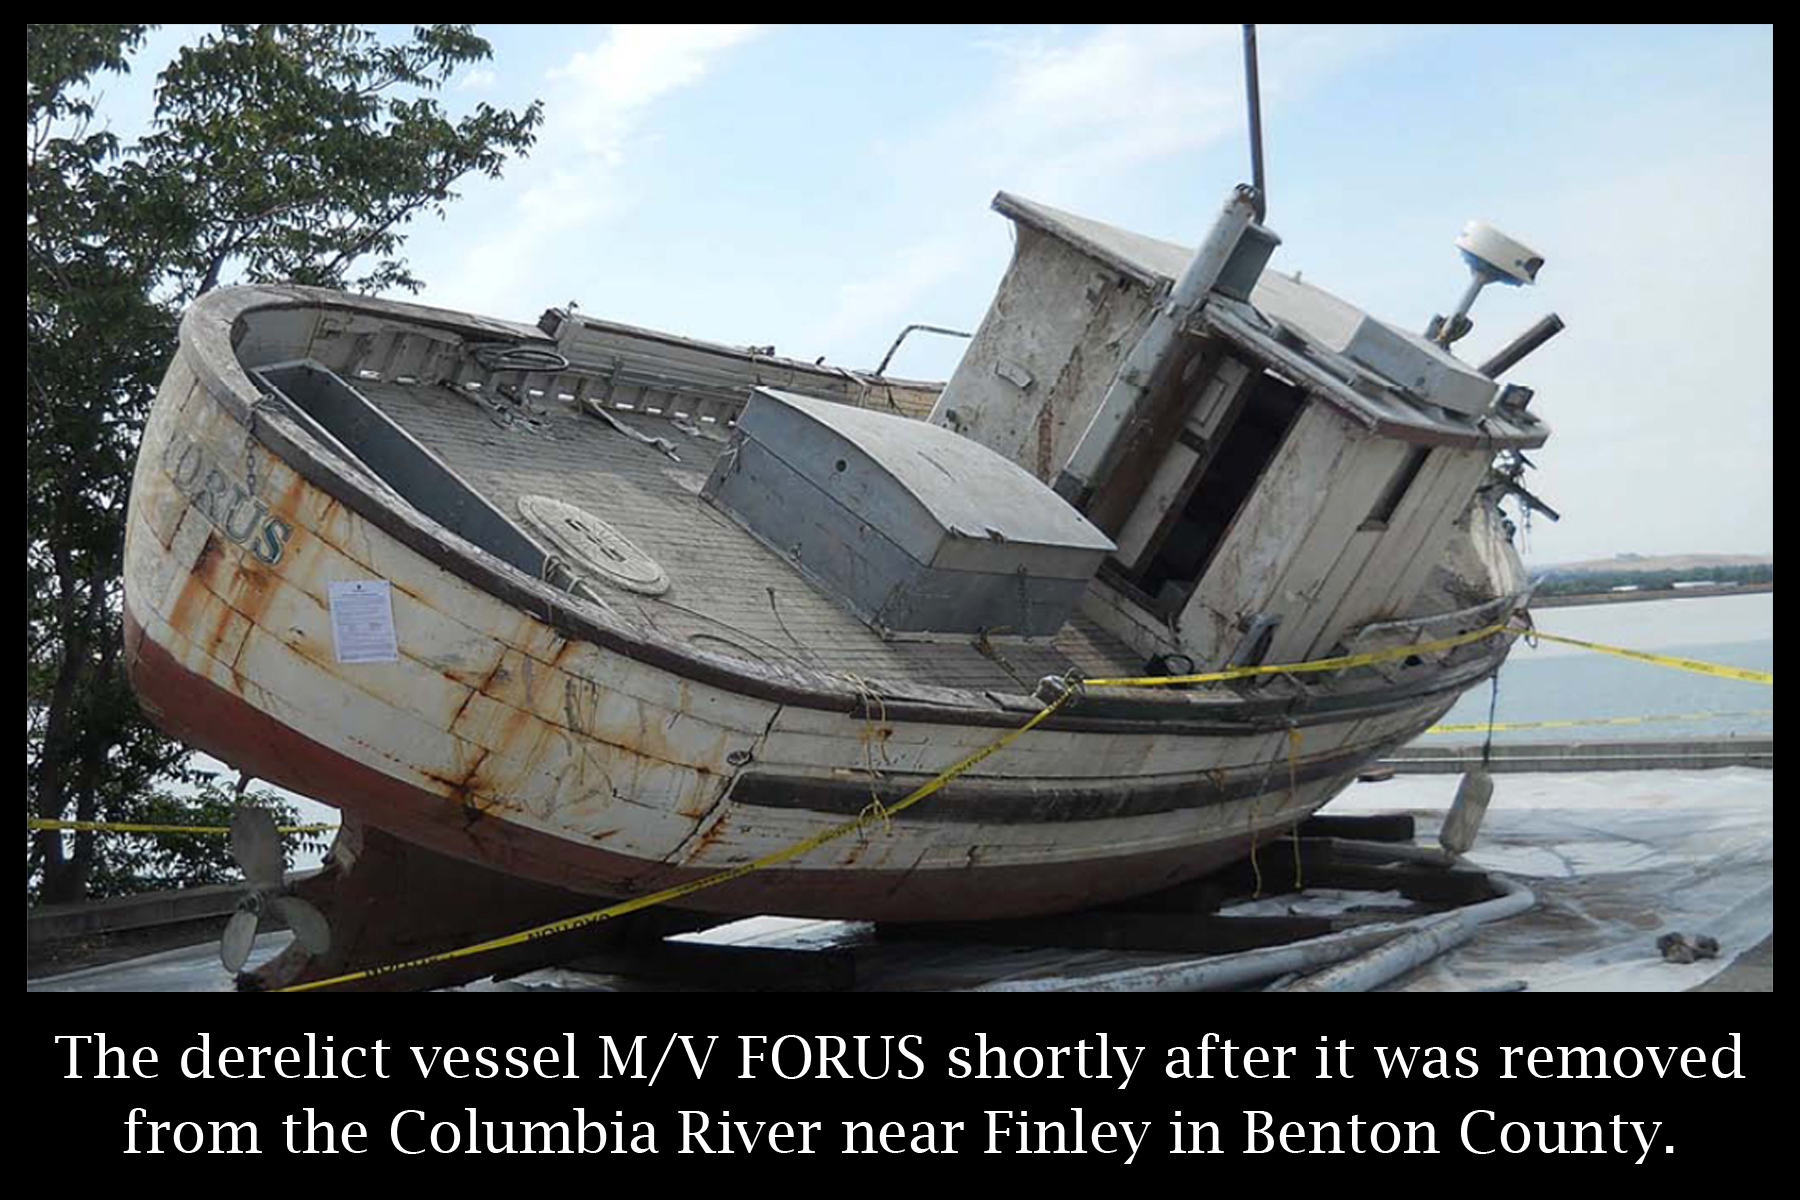 March 2014 - Derelict Vessel